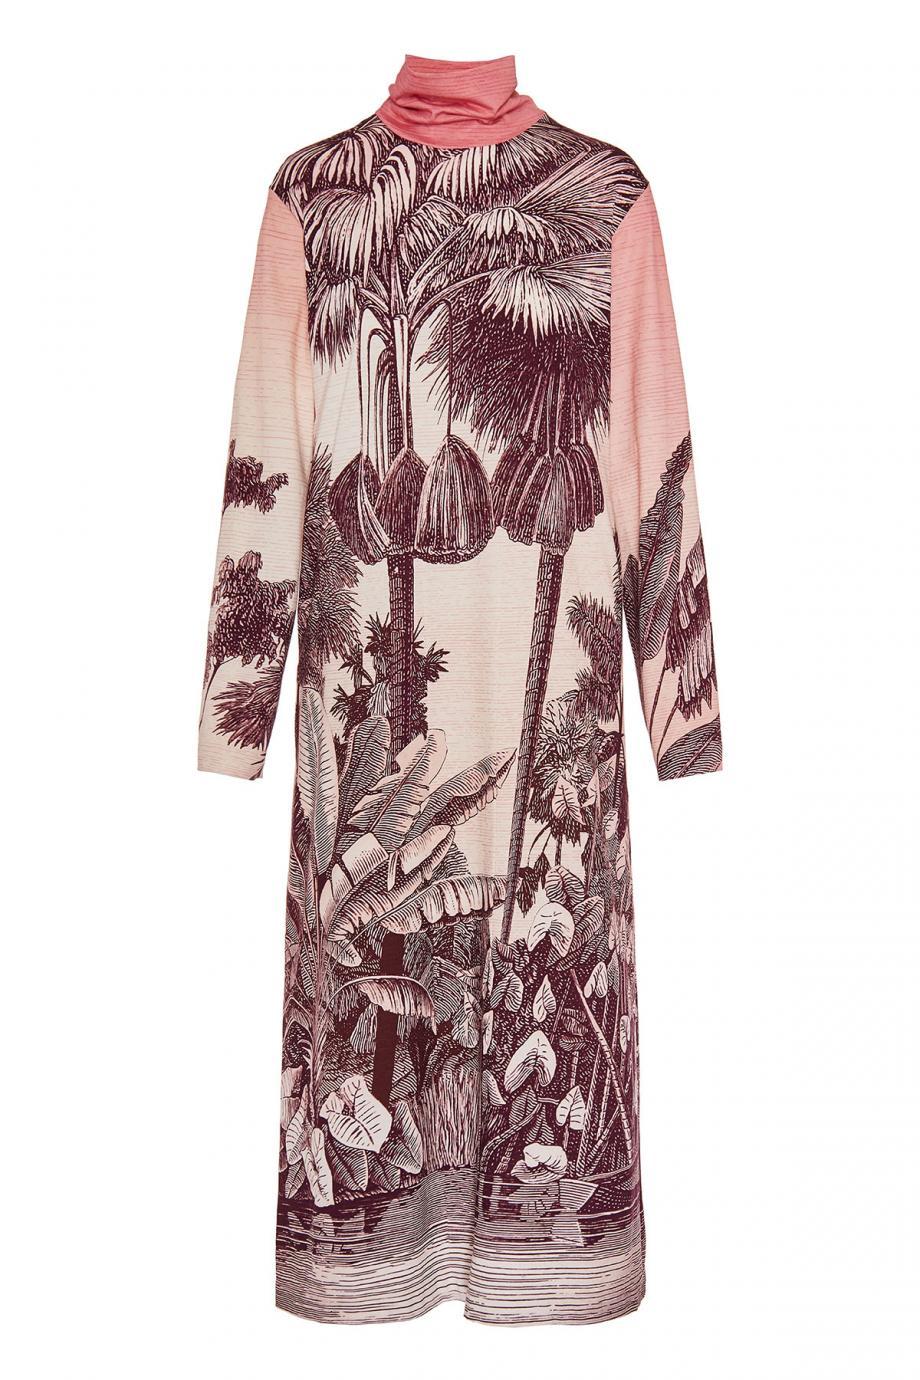 Printed cotton turtleneck midi dress